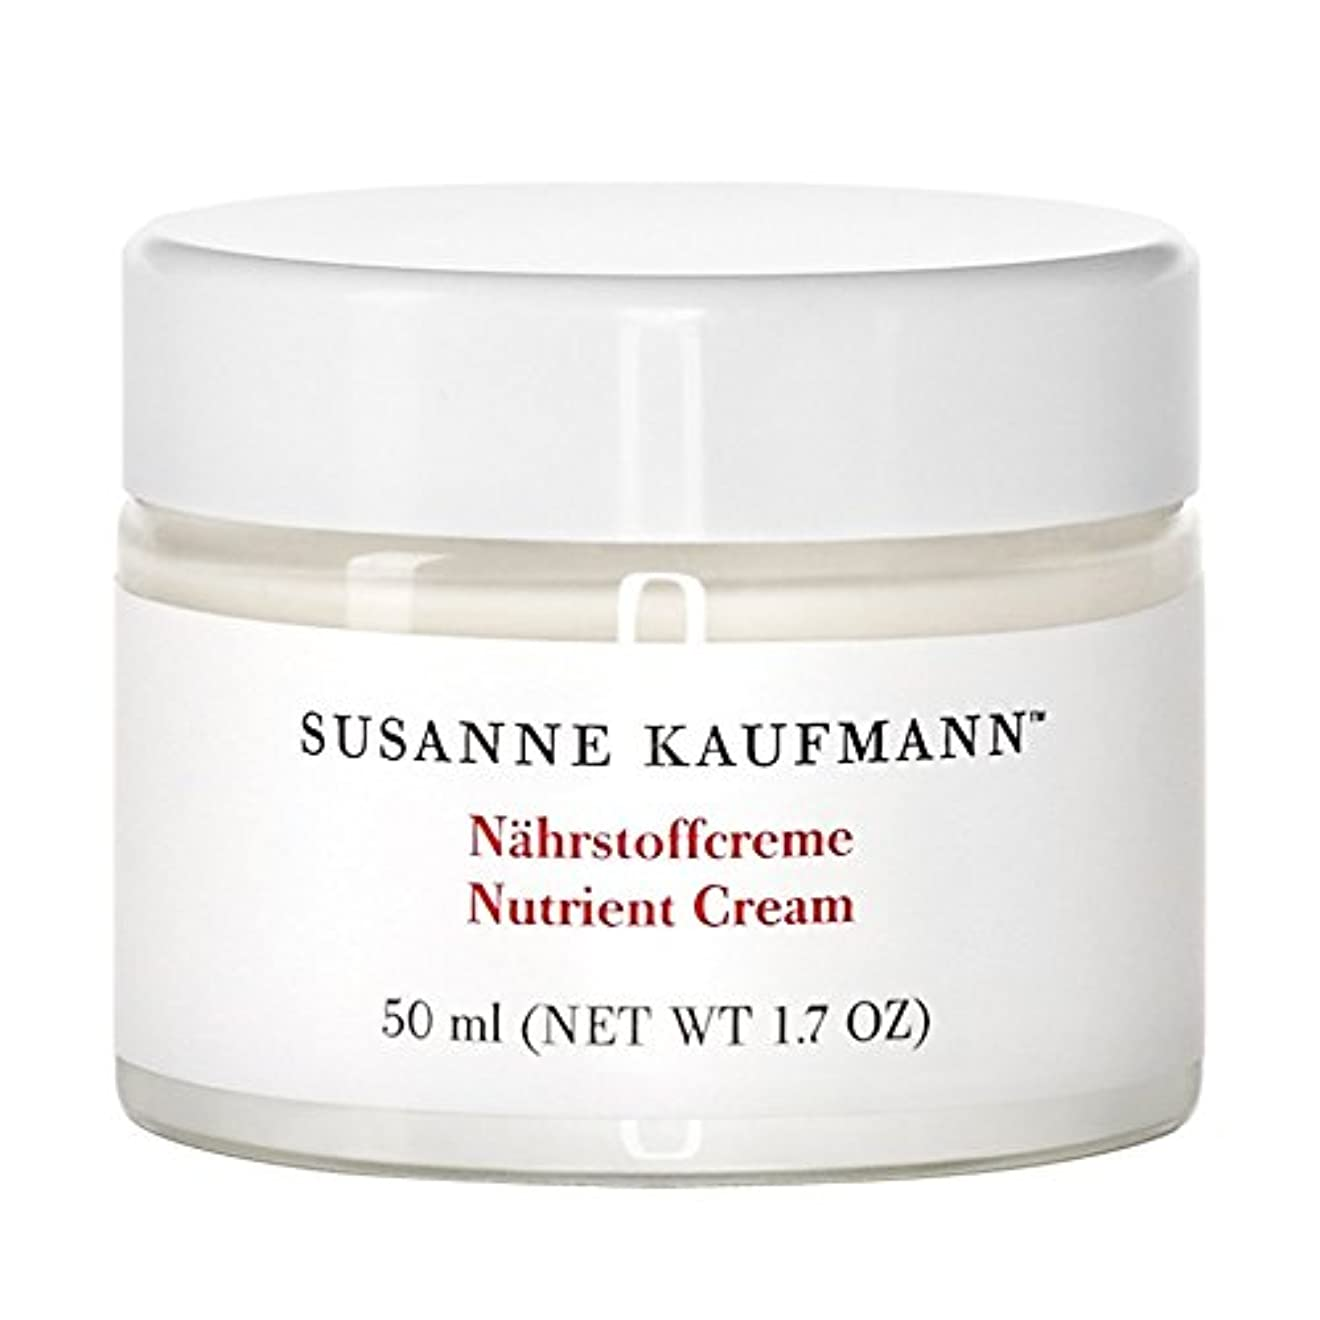 Susanne Kaufmann Nutrient Cream 50ml (Pack of 6) - スザンヌカウフマン栄養クリーム50 x6 [並行輸入品]